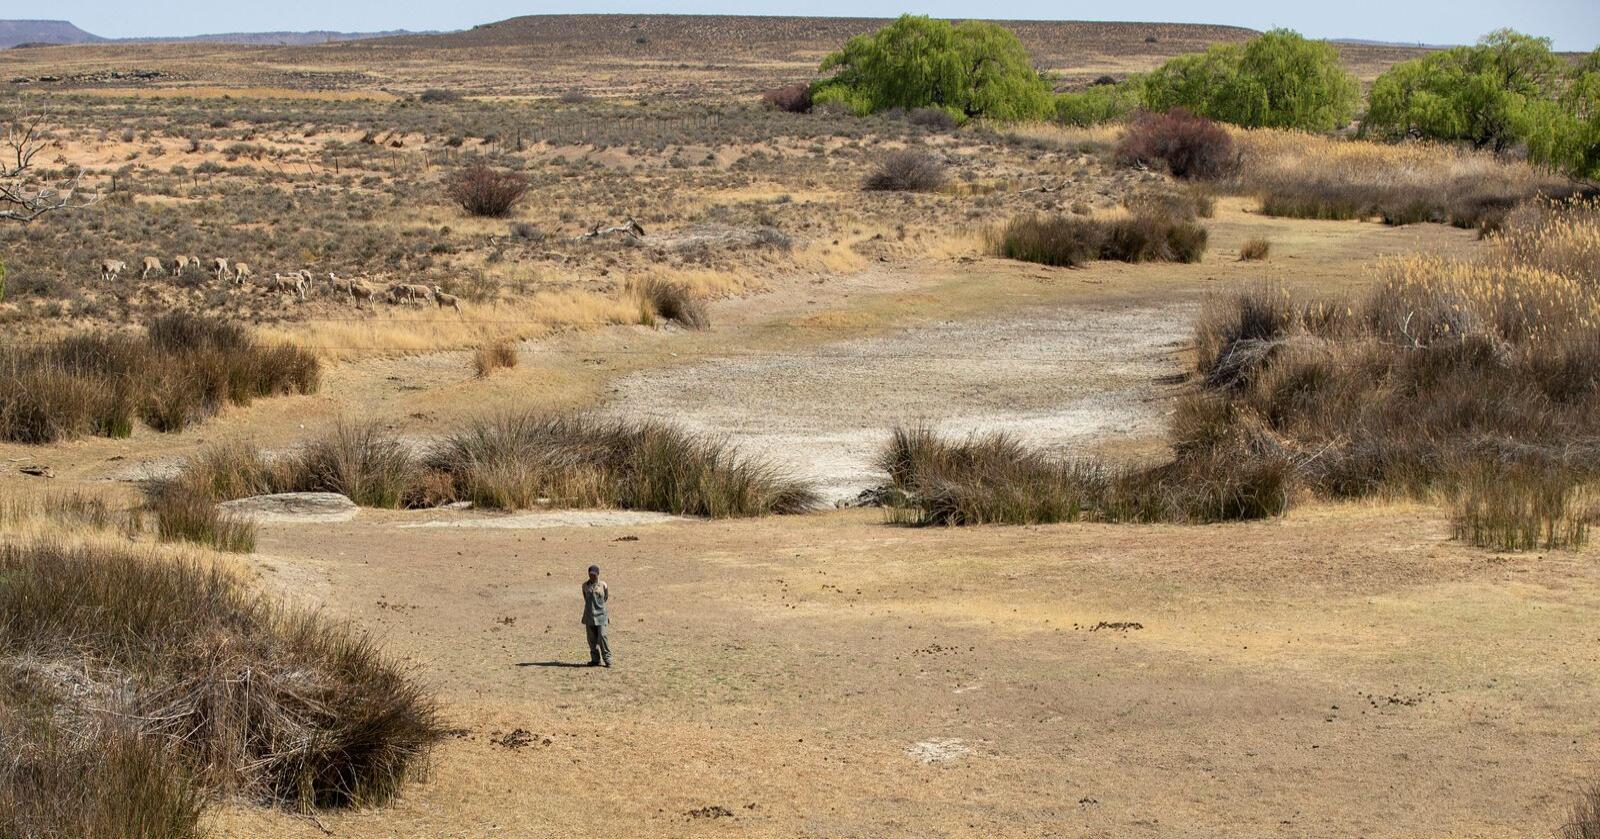 Flere klimafaktorer forverrer menneskers helse over hele verden, ifølge en ny rapport fra WHO. Arkivfoto: Themba Hadebe / AP / NTB